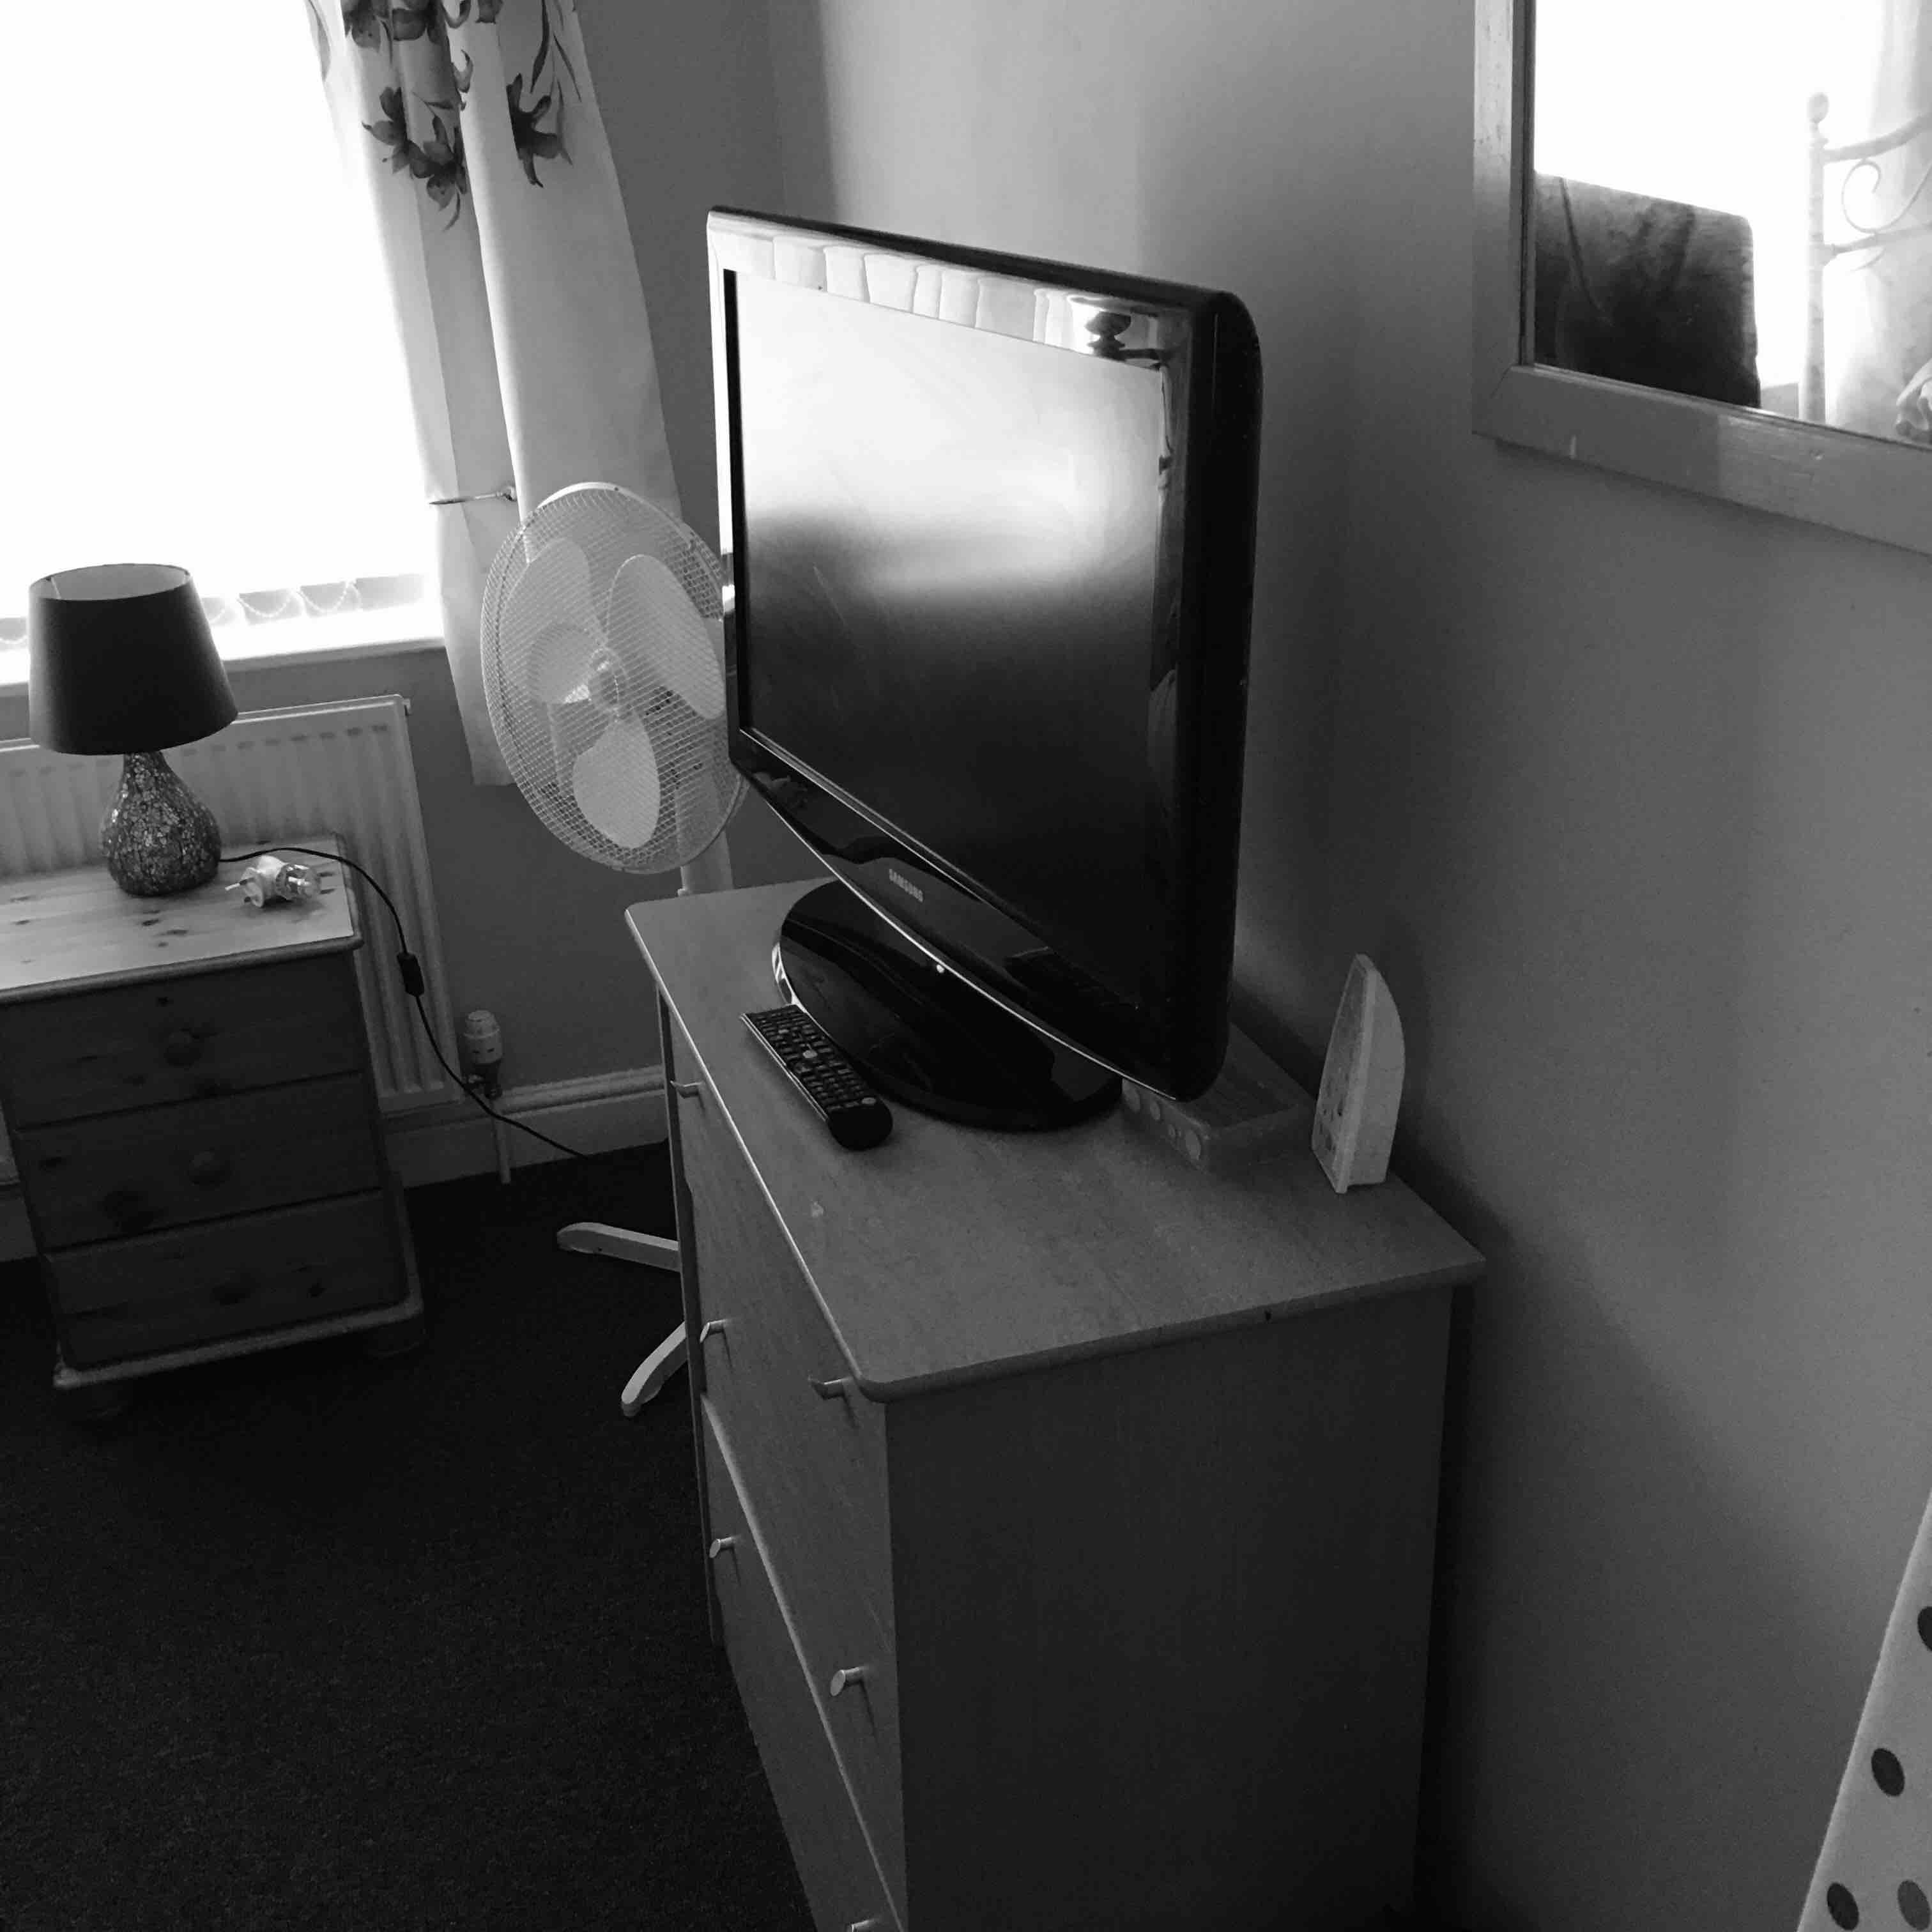 1 room in Henbury, Bristol, BS10 5PZ RoomsLocal image